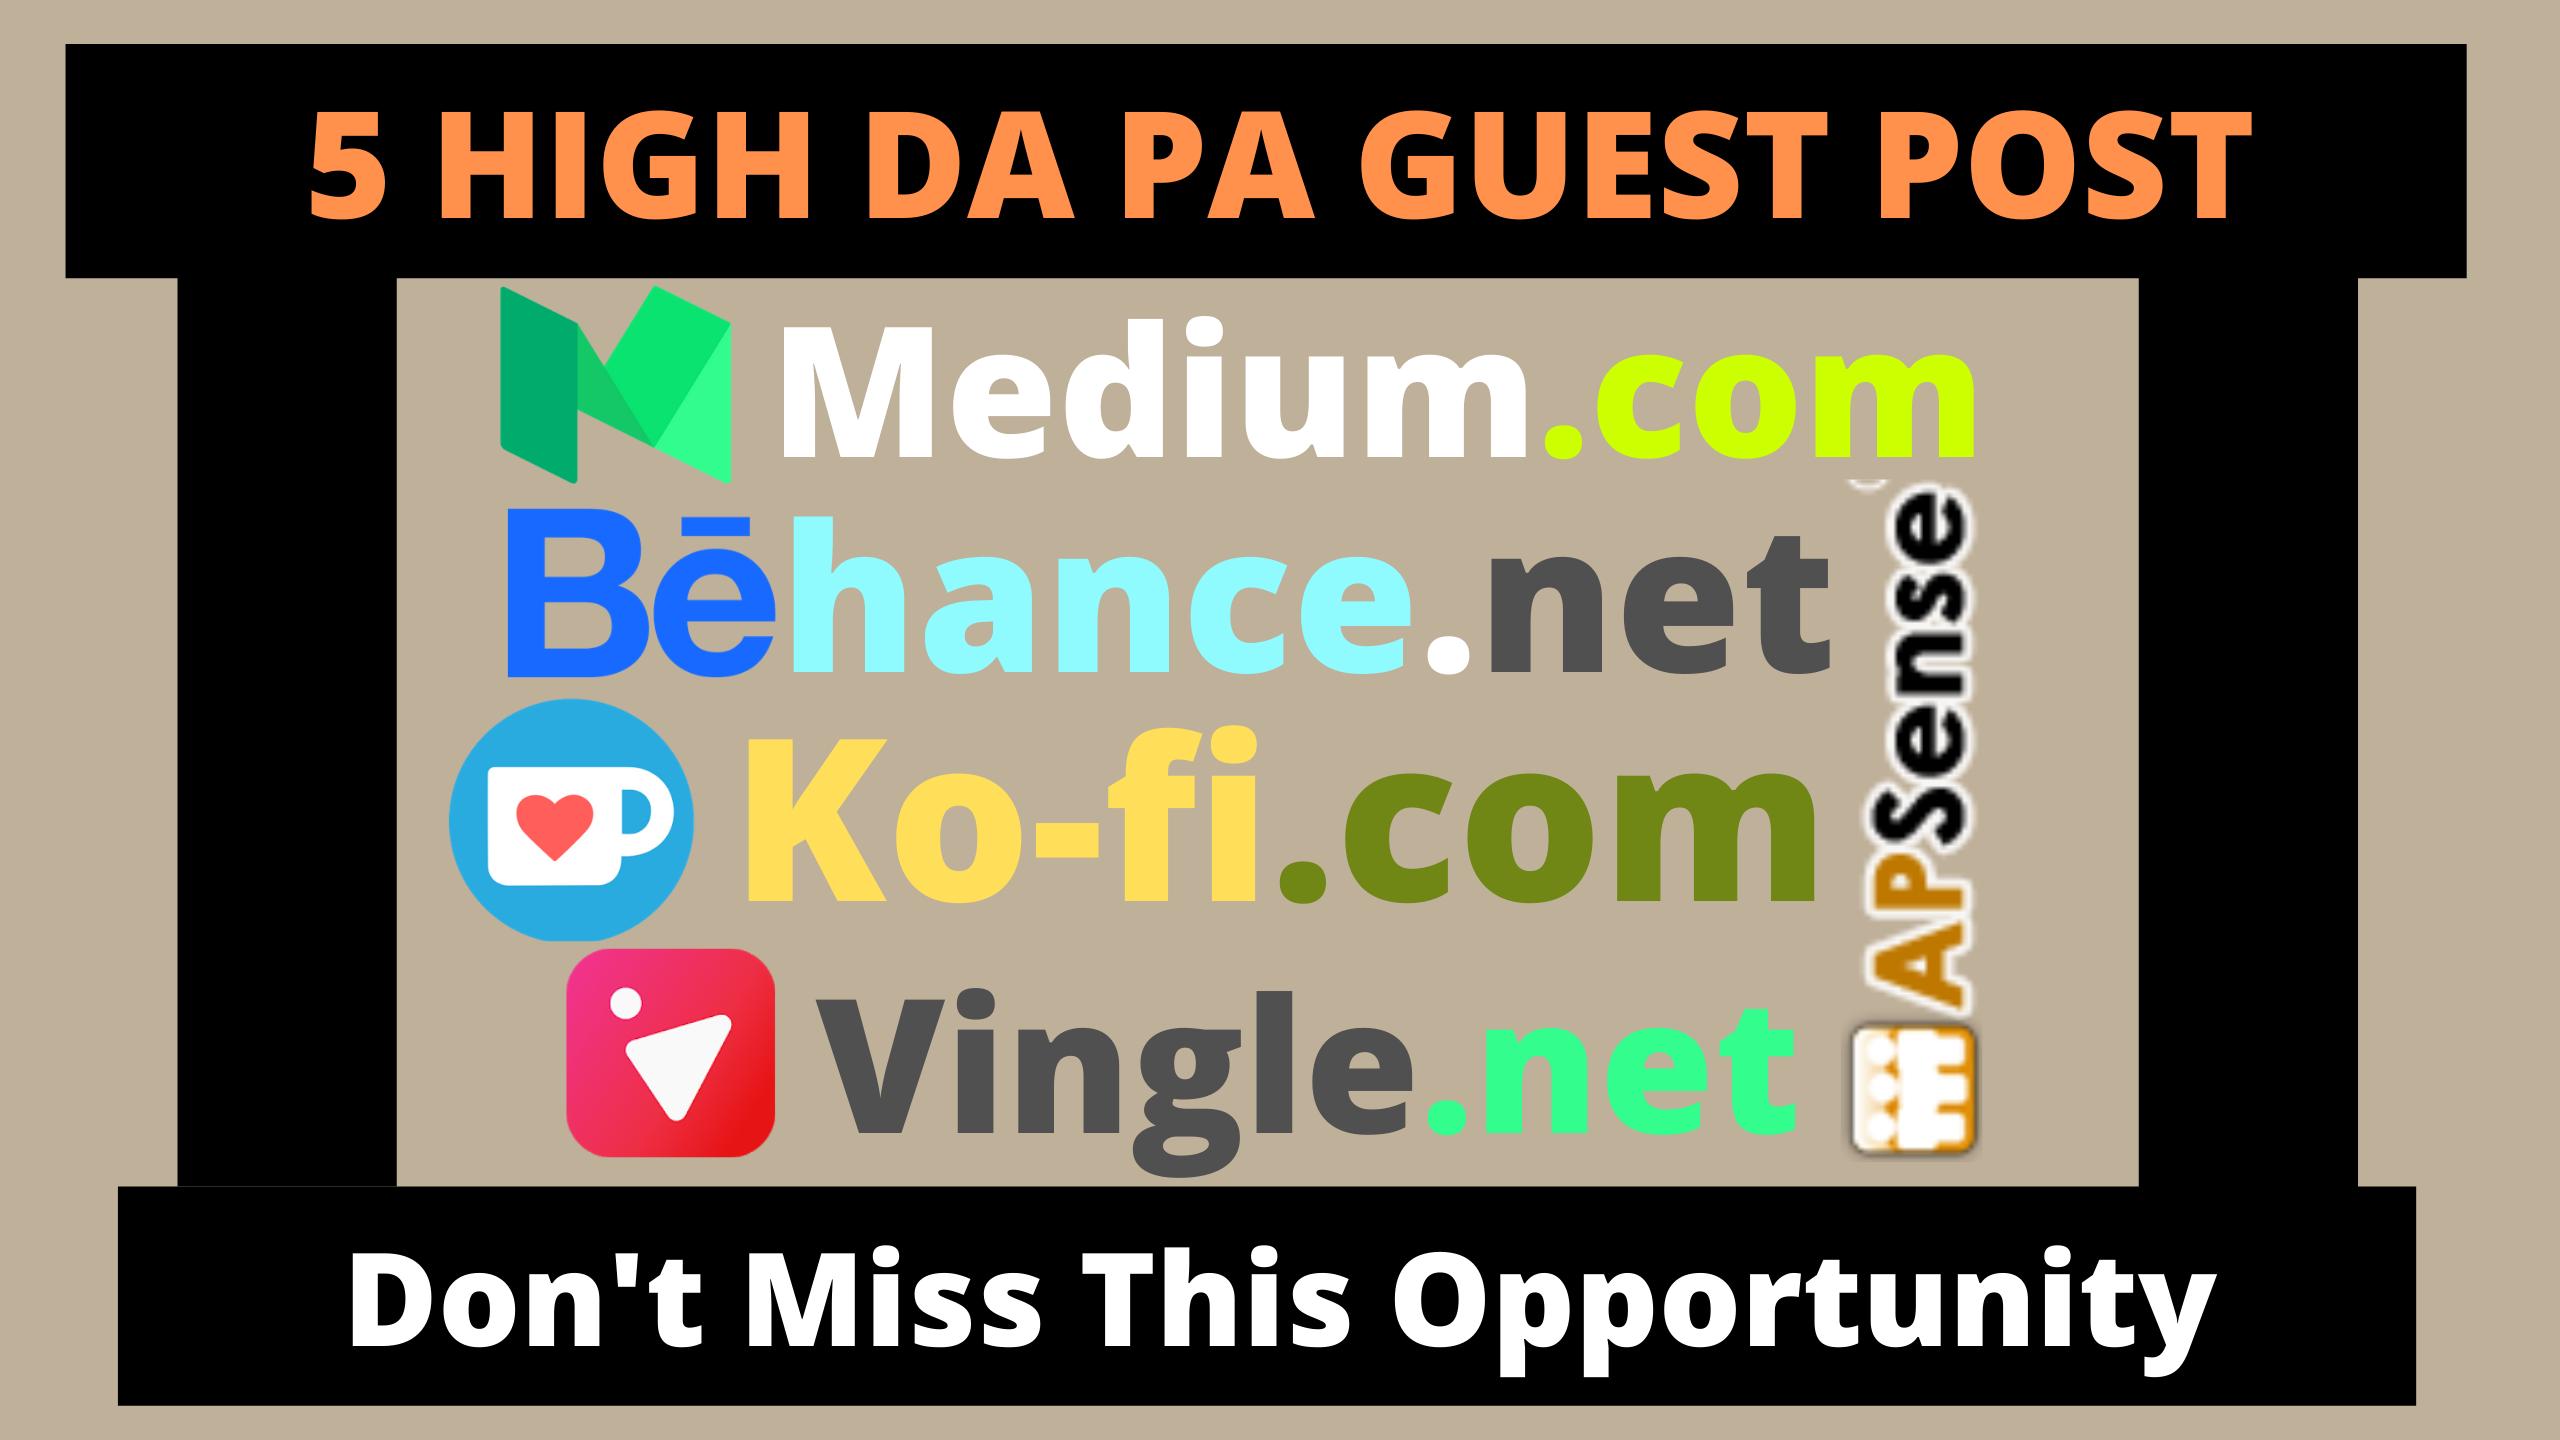 Publish 5 Guest Post On Medium,  Behance,  Ko-fi,  Vingle,  Apsense With Permanent Backlinks